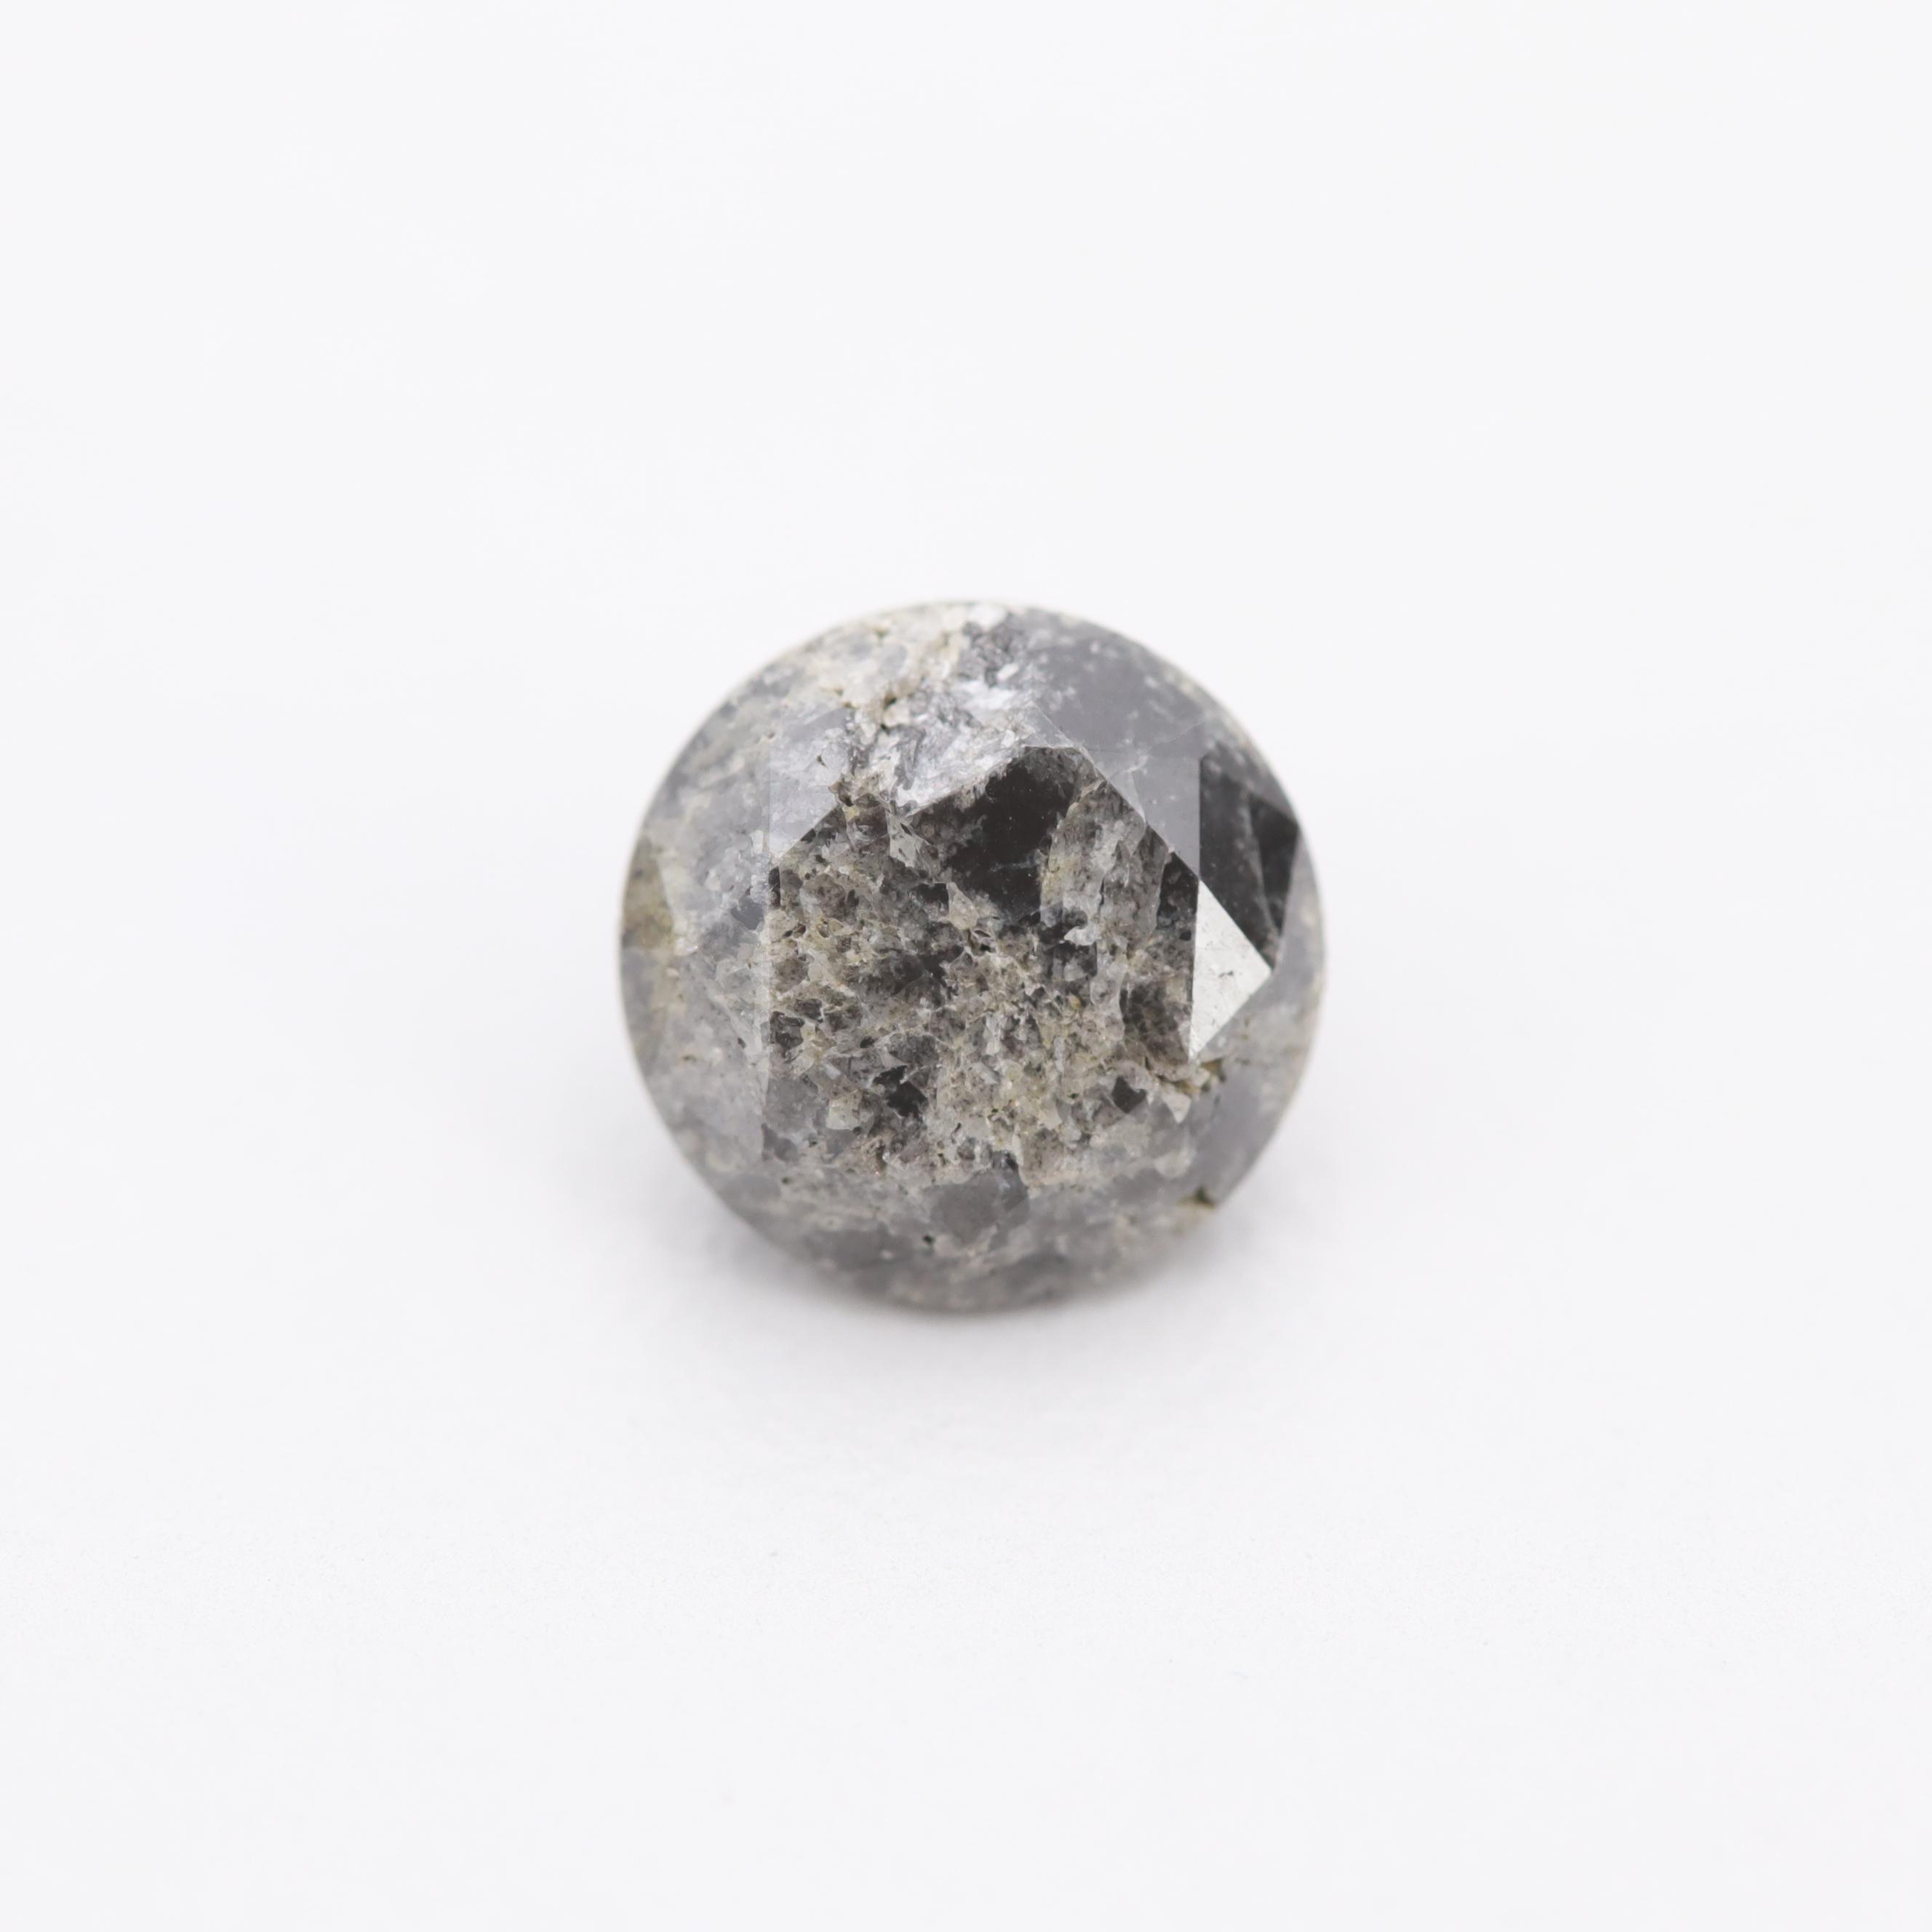 Loose 2.50 CT Black Diamond